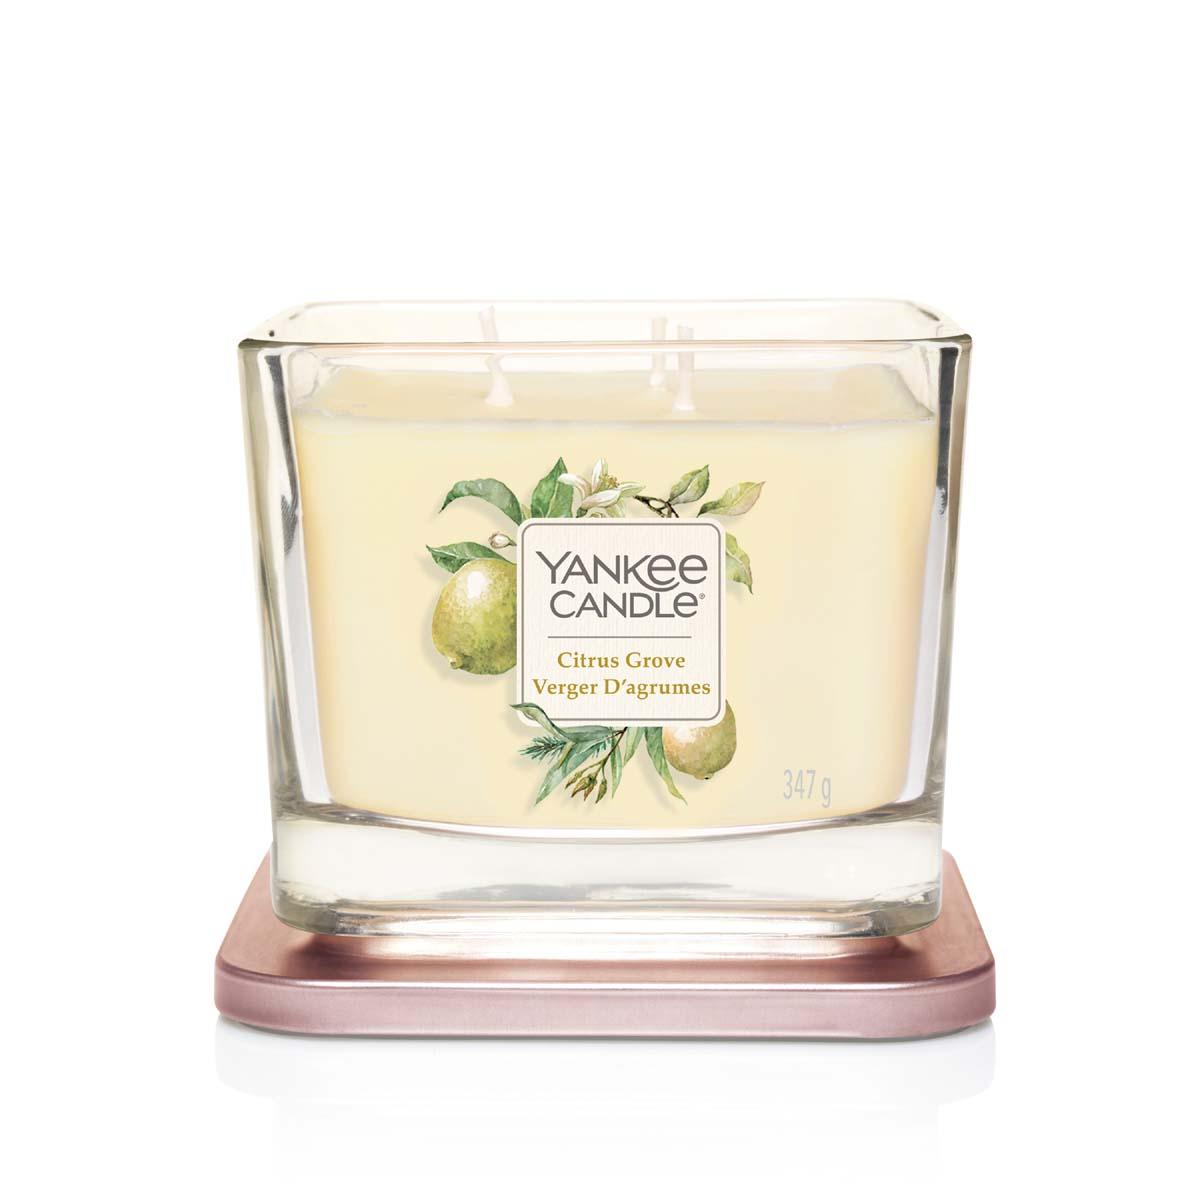 Yankee Candle Citrus Grove Square Vessel Media